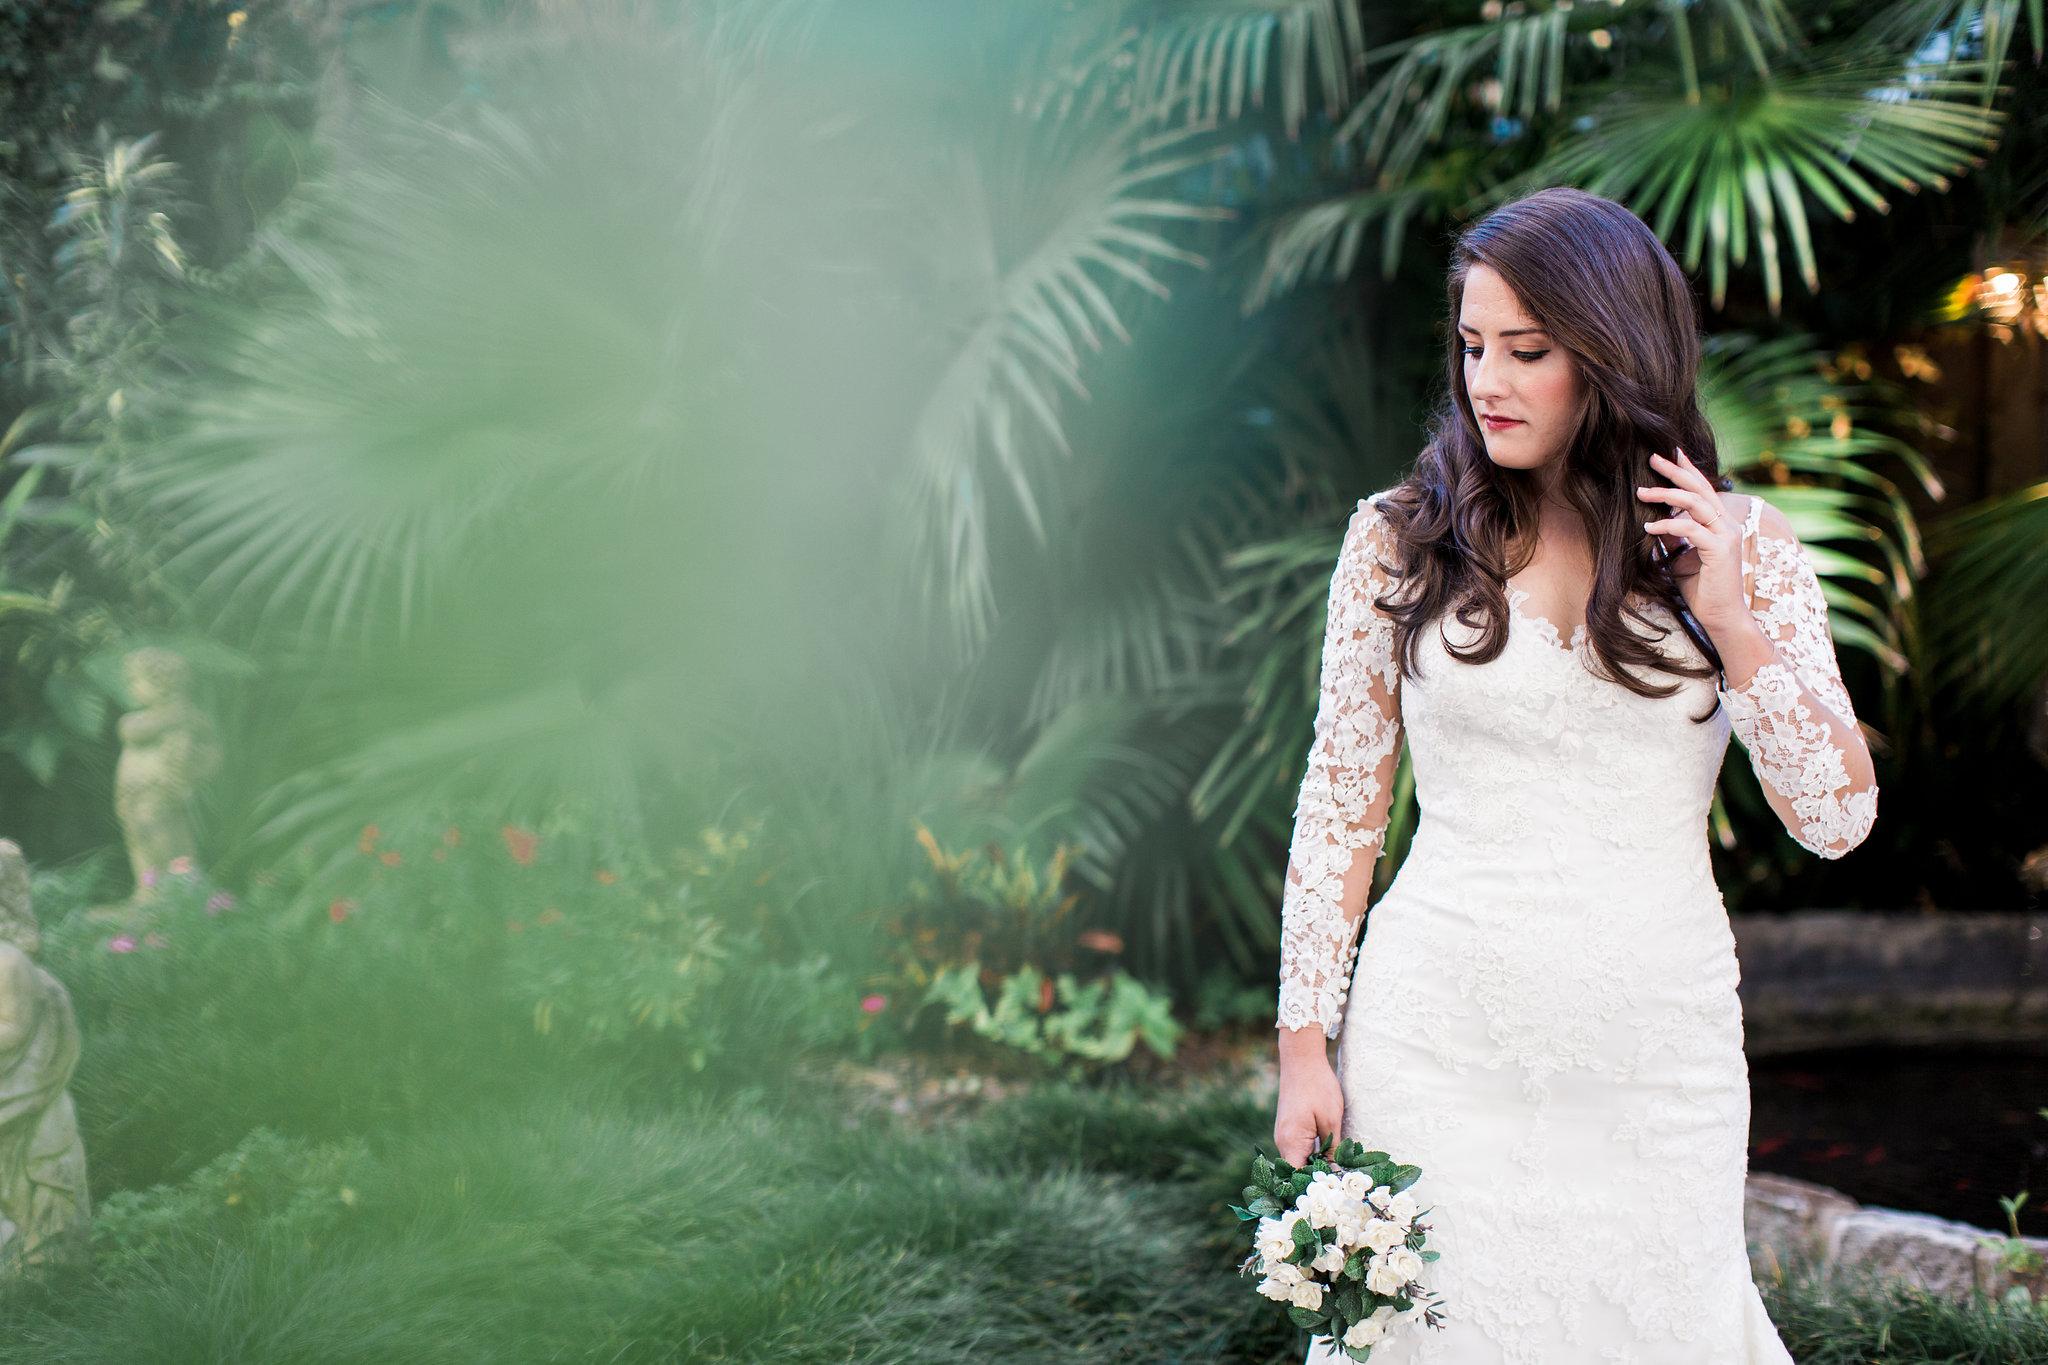 Rosie's Bridal Session in Savannah, Georgia | Savannah Wedding Photographer | Apt. B Photography